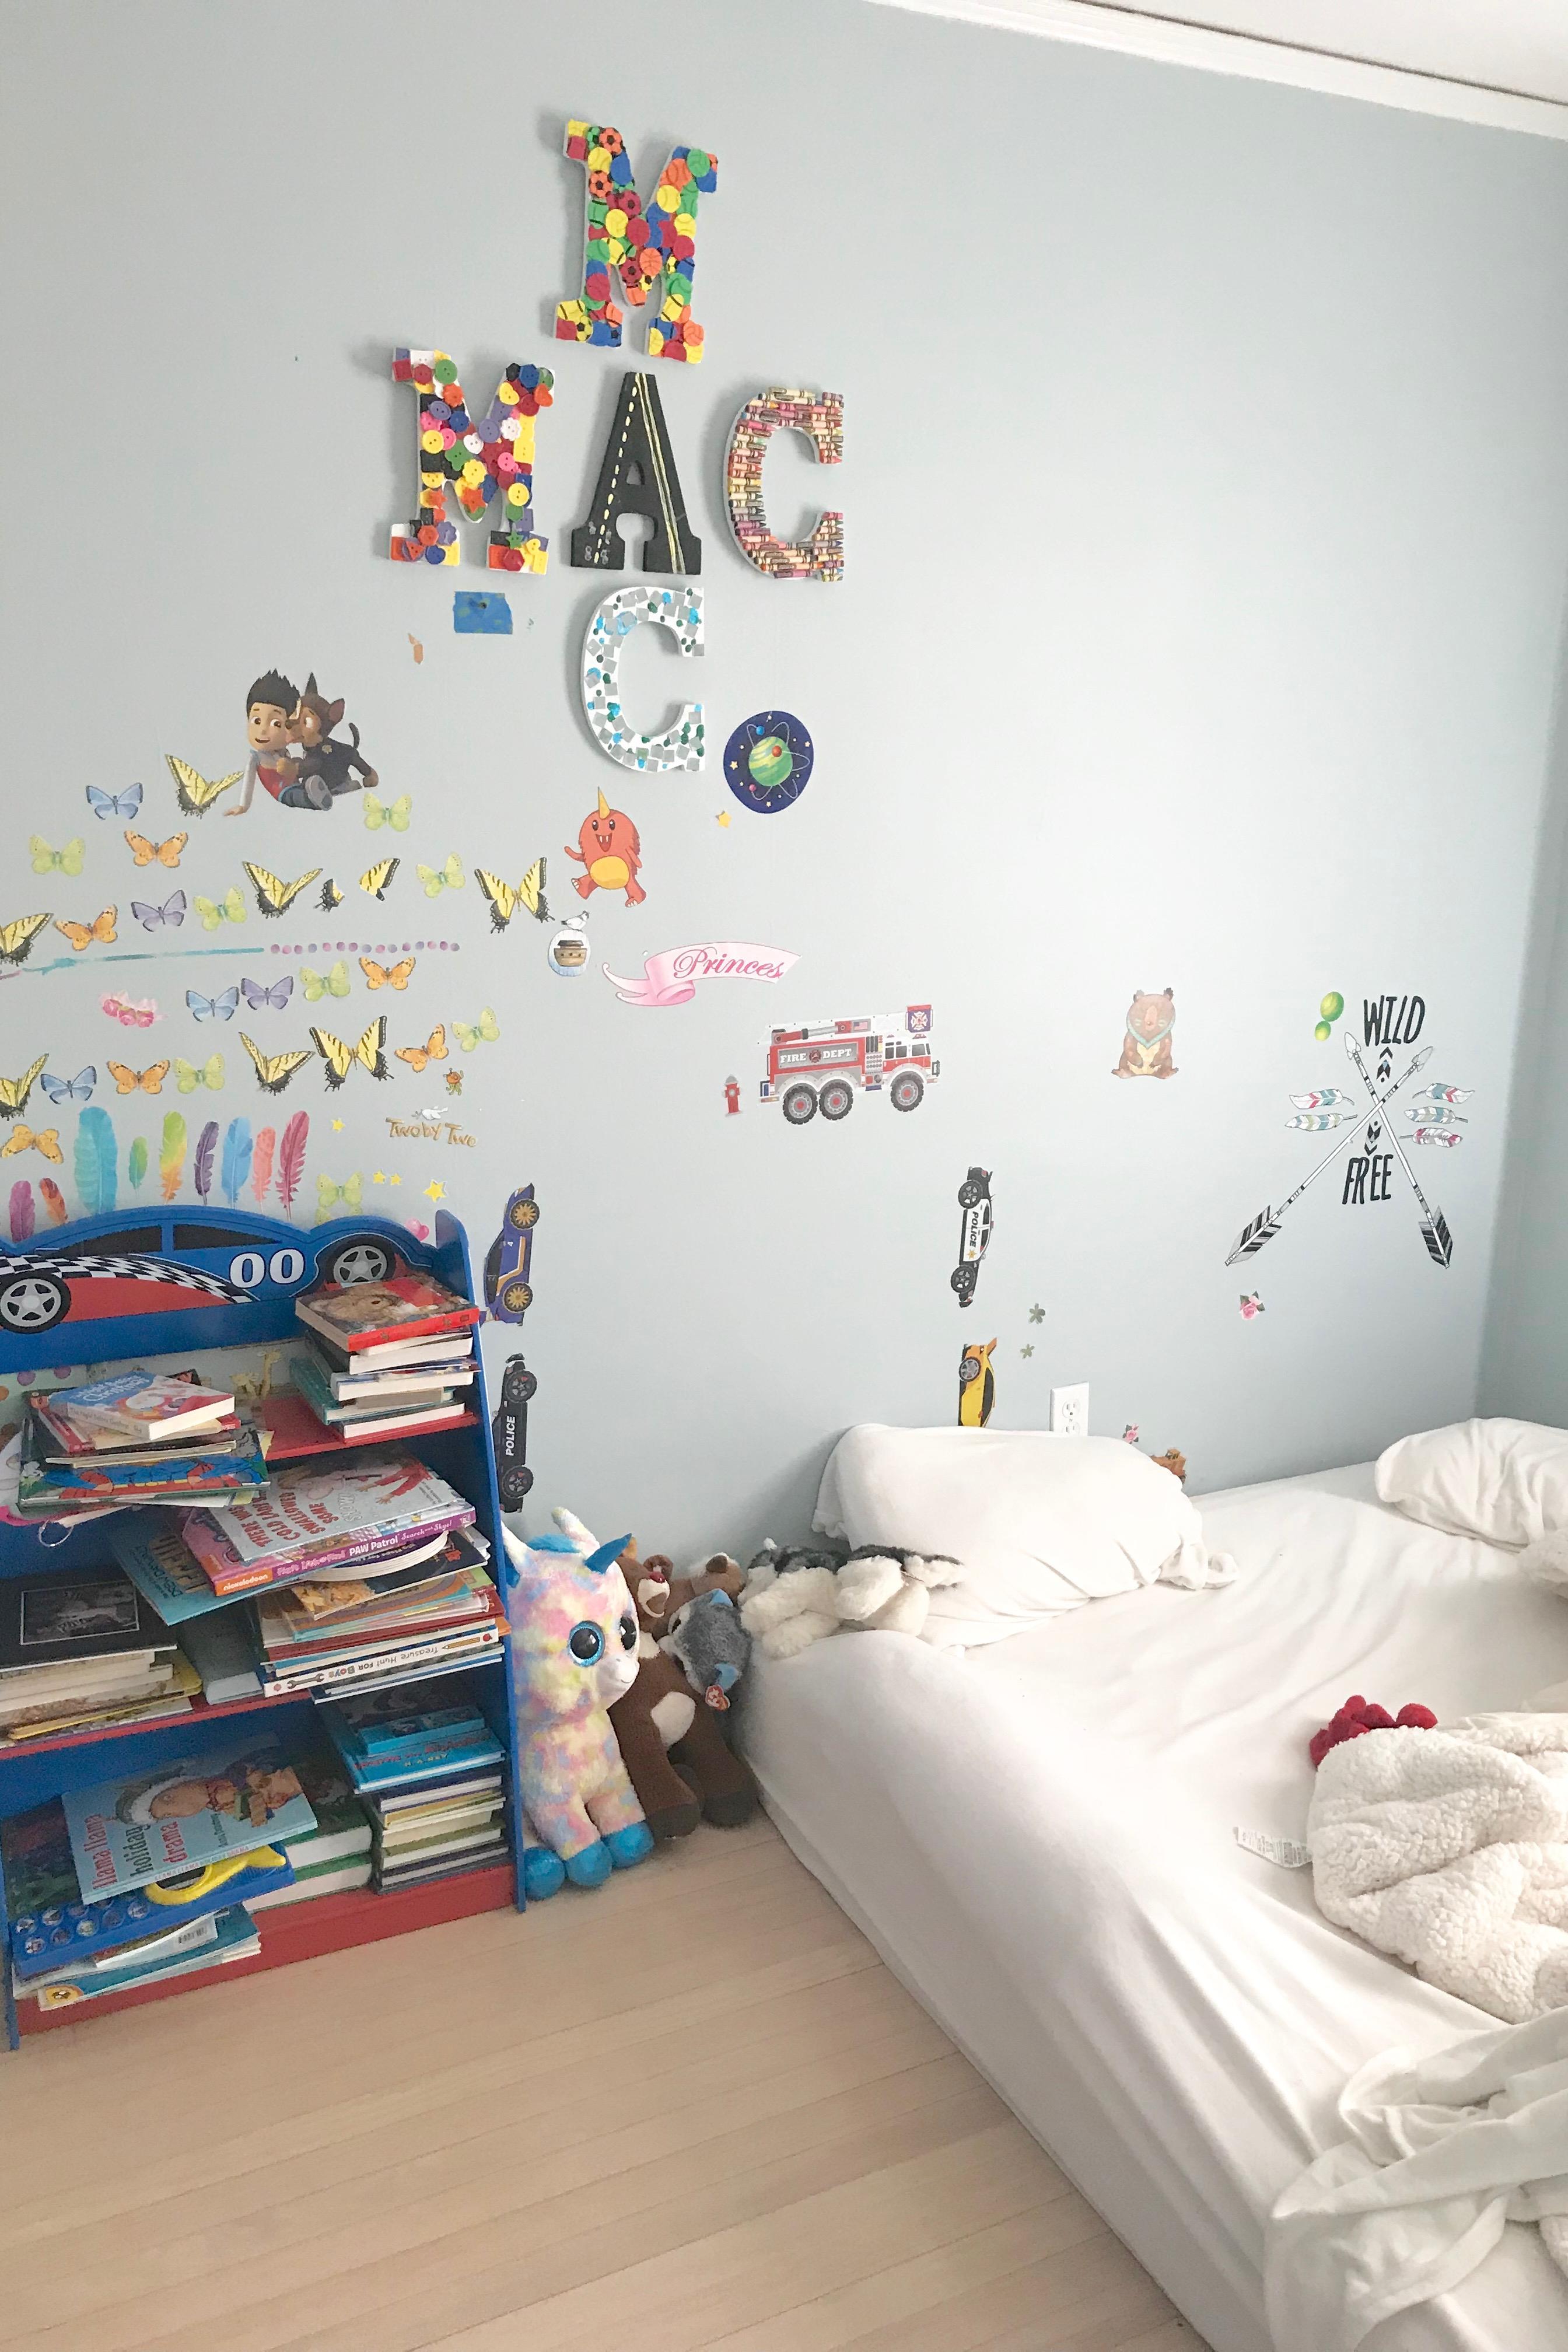 boys bedroom ideas - before photo of bedroom on pinteresting plans blog